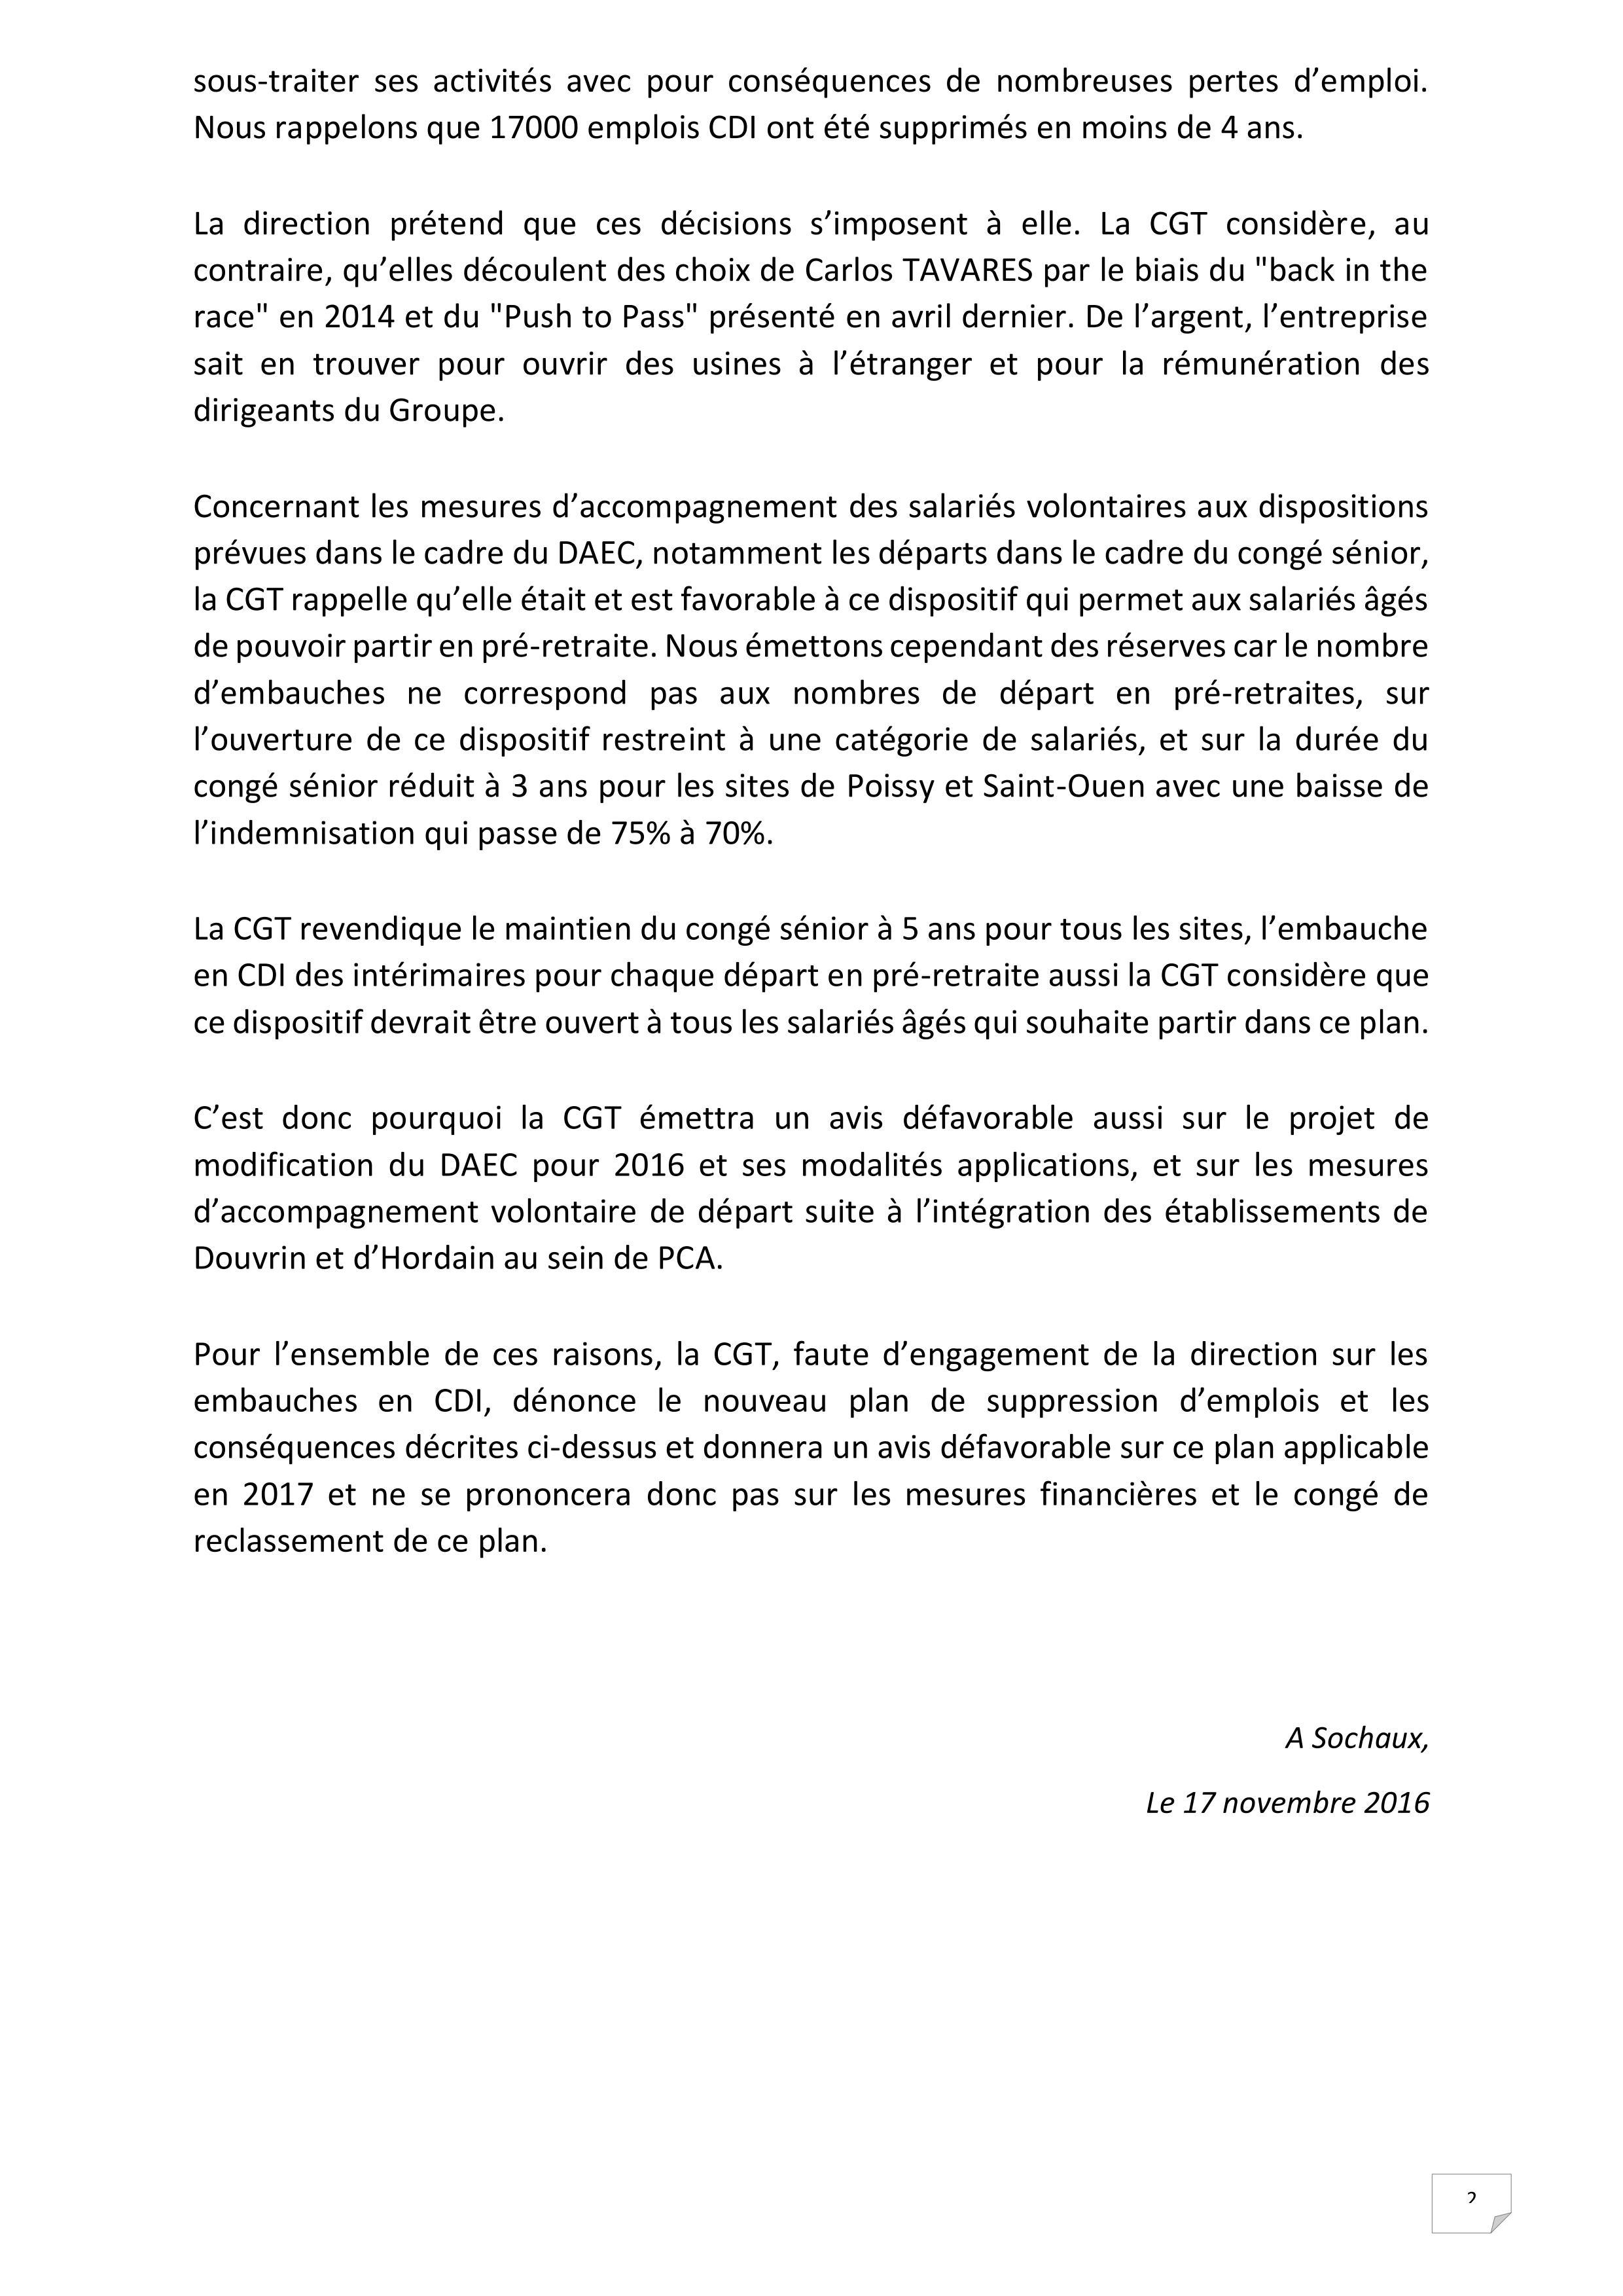 declaration-ce-daec_01